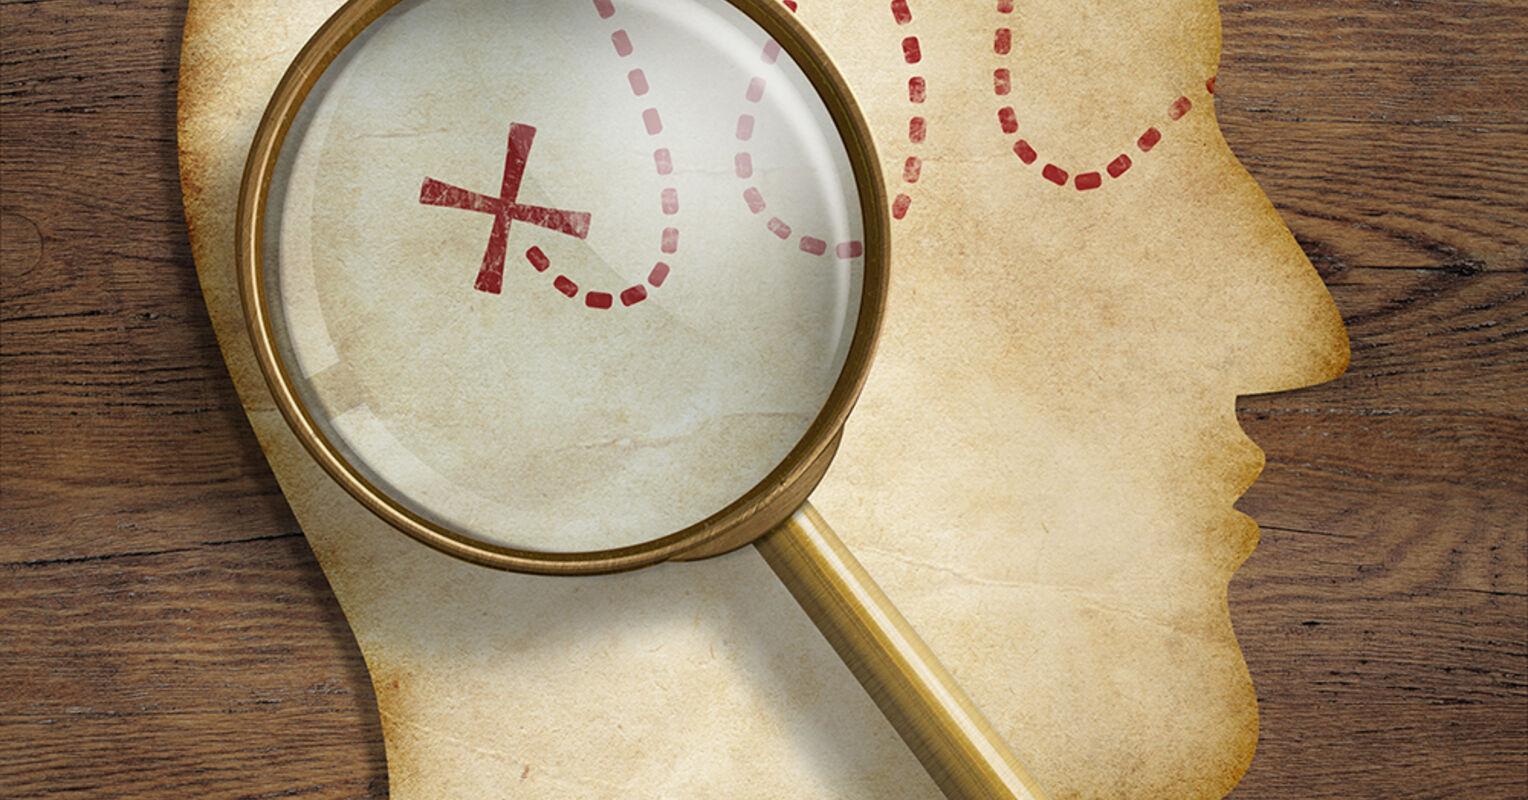 Predictive Analytics in Hiring - tech360 betterhiring.com cover image